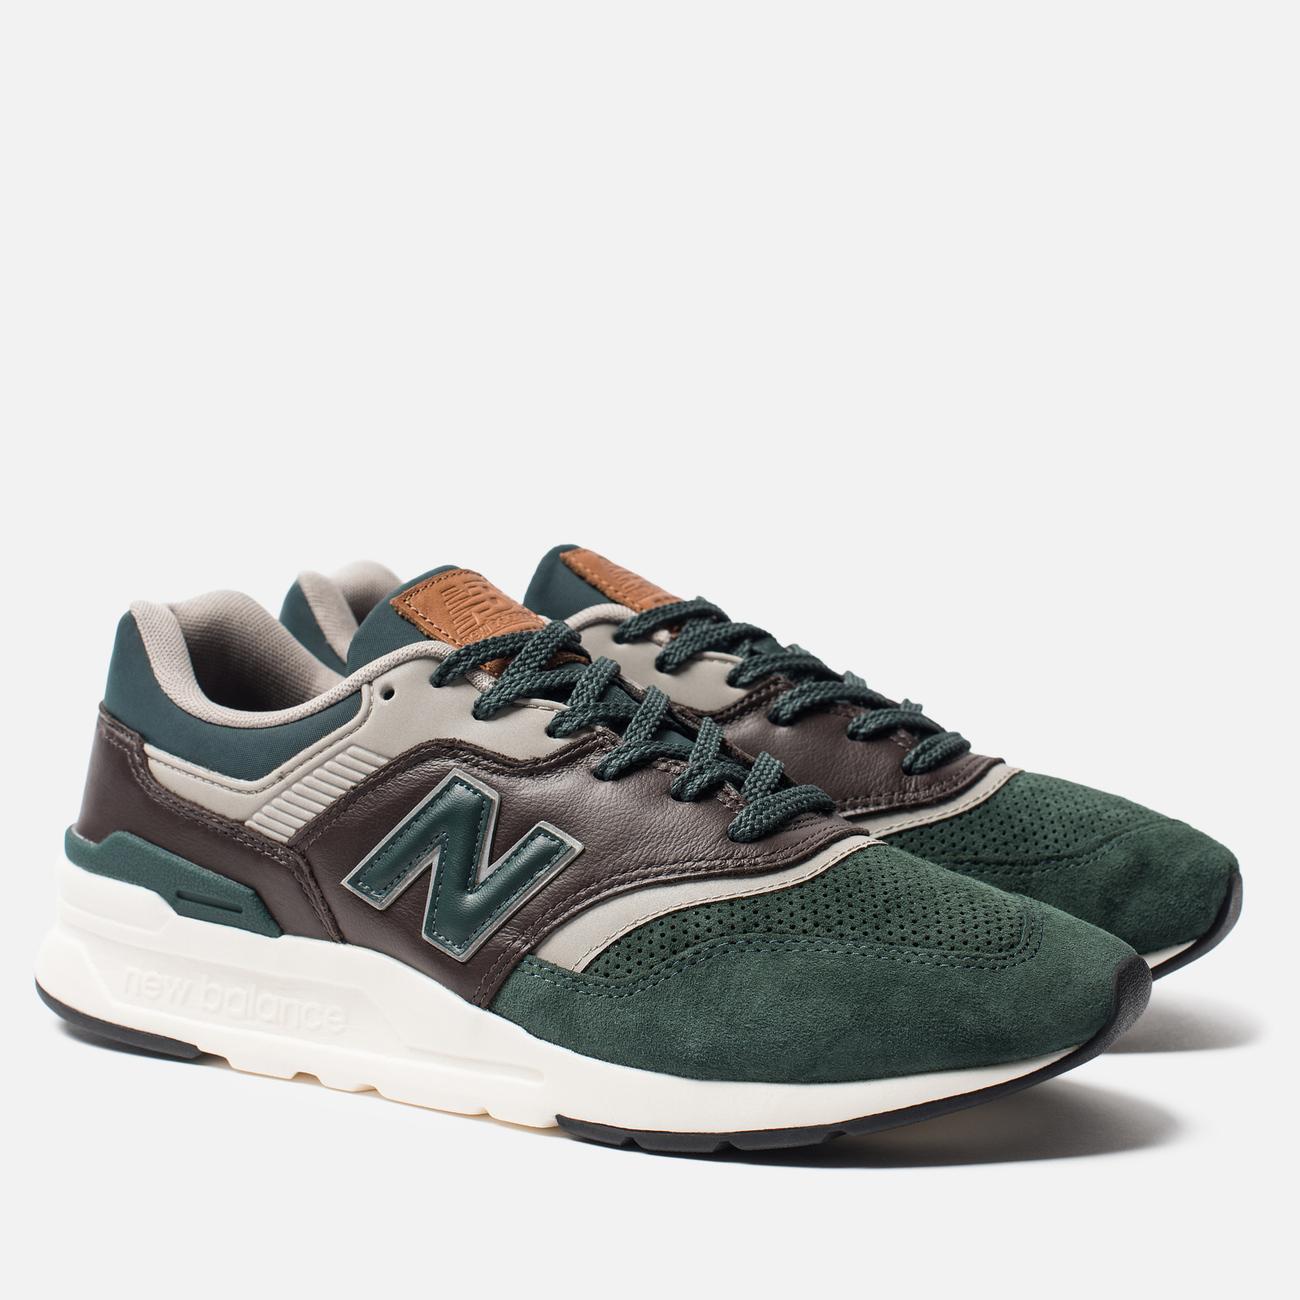 Мужские кроссовки New Balance CM997HXA Green/Black